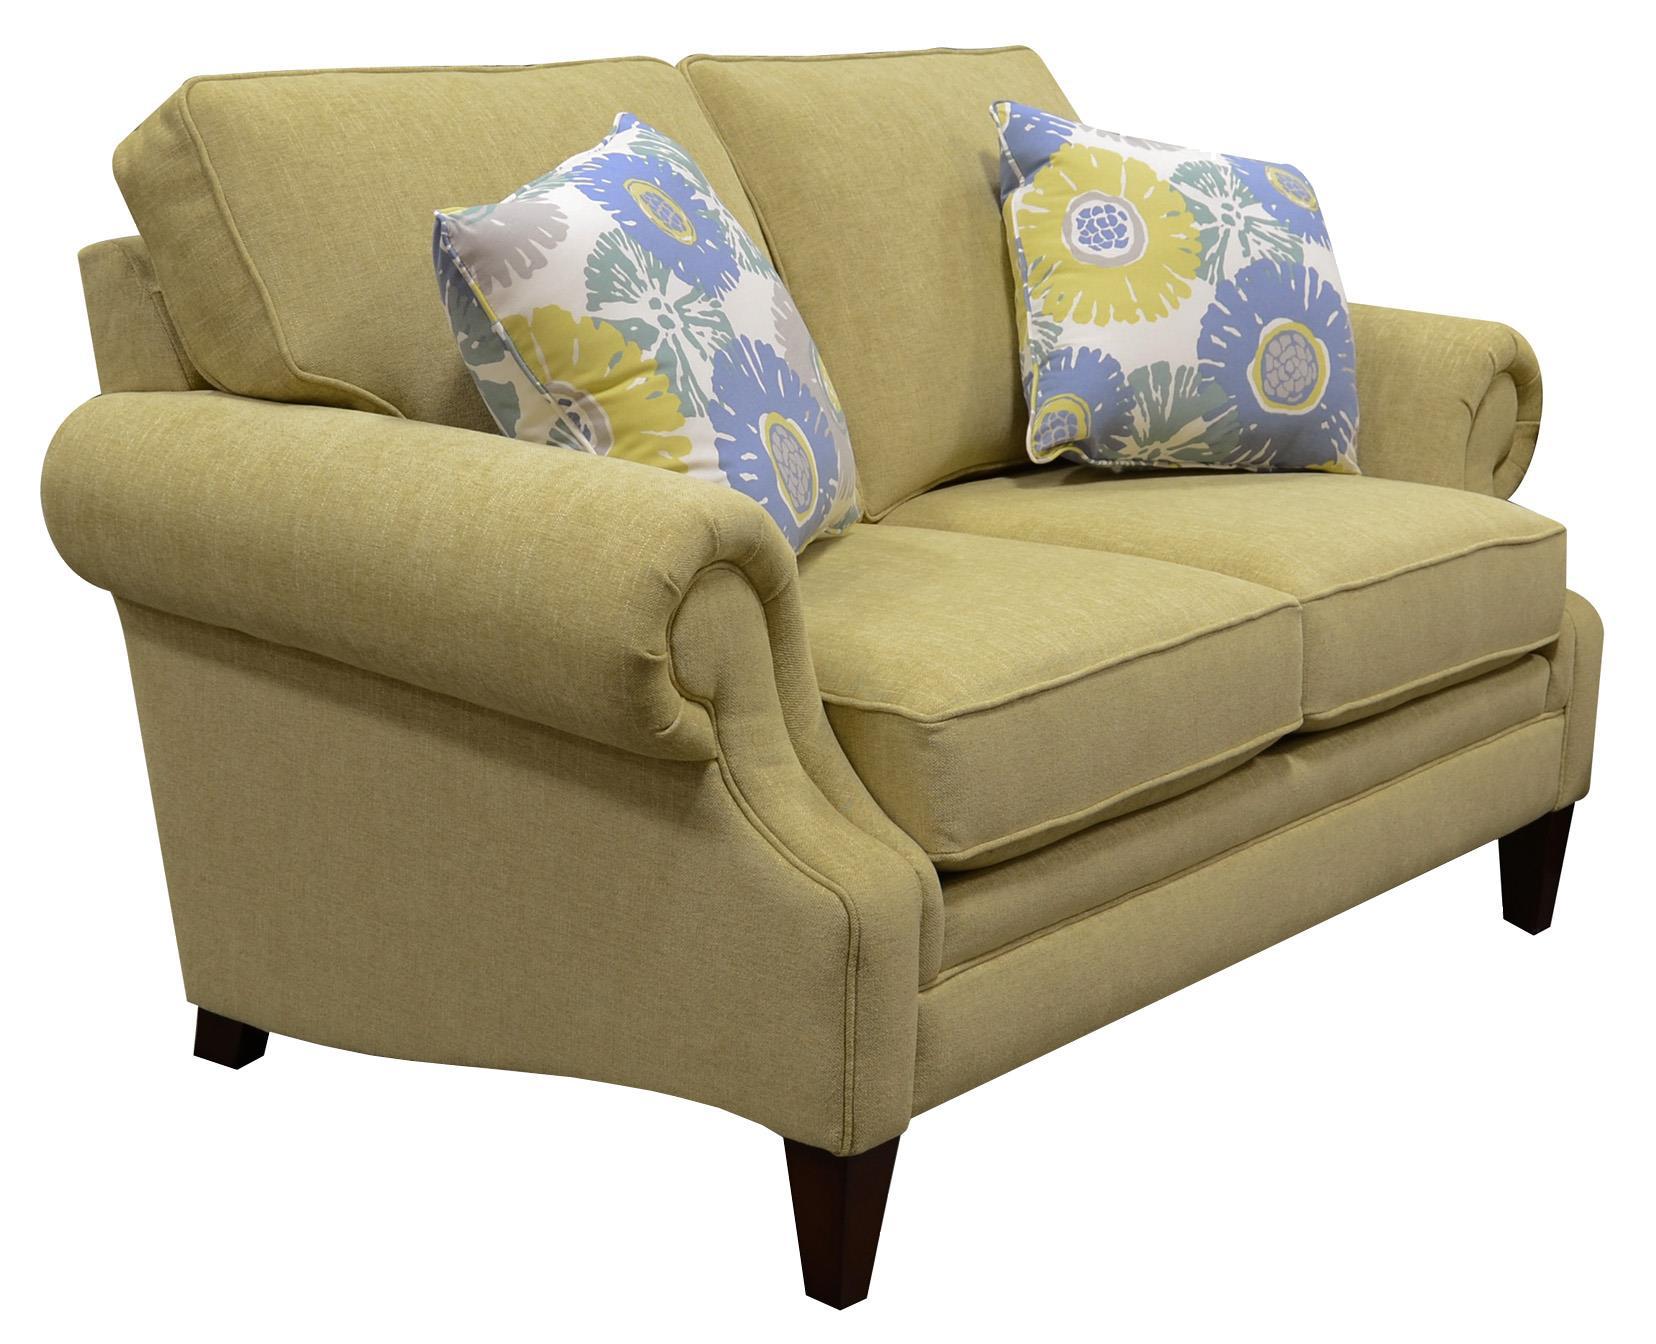 England Xandi Loveseat Prime Brothers Furniture Love Seats